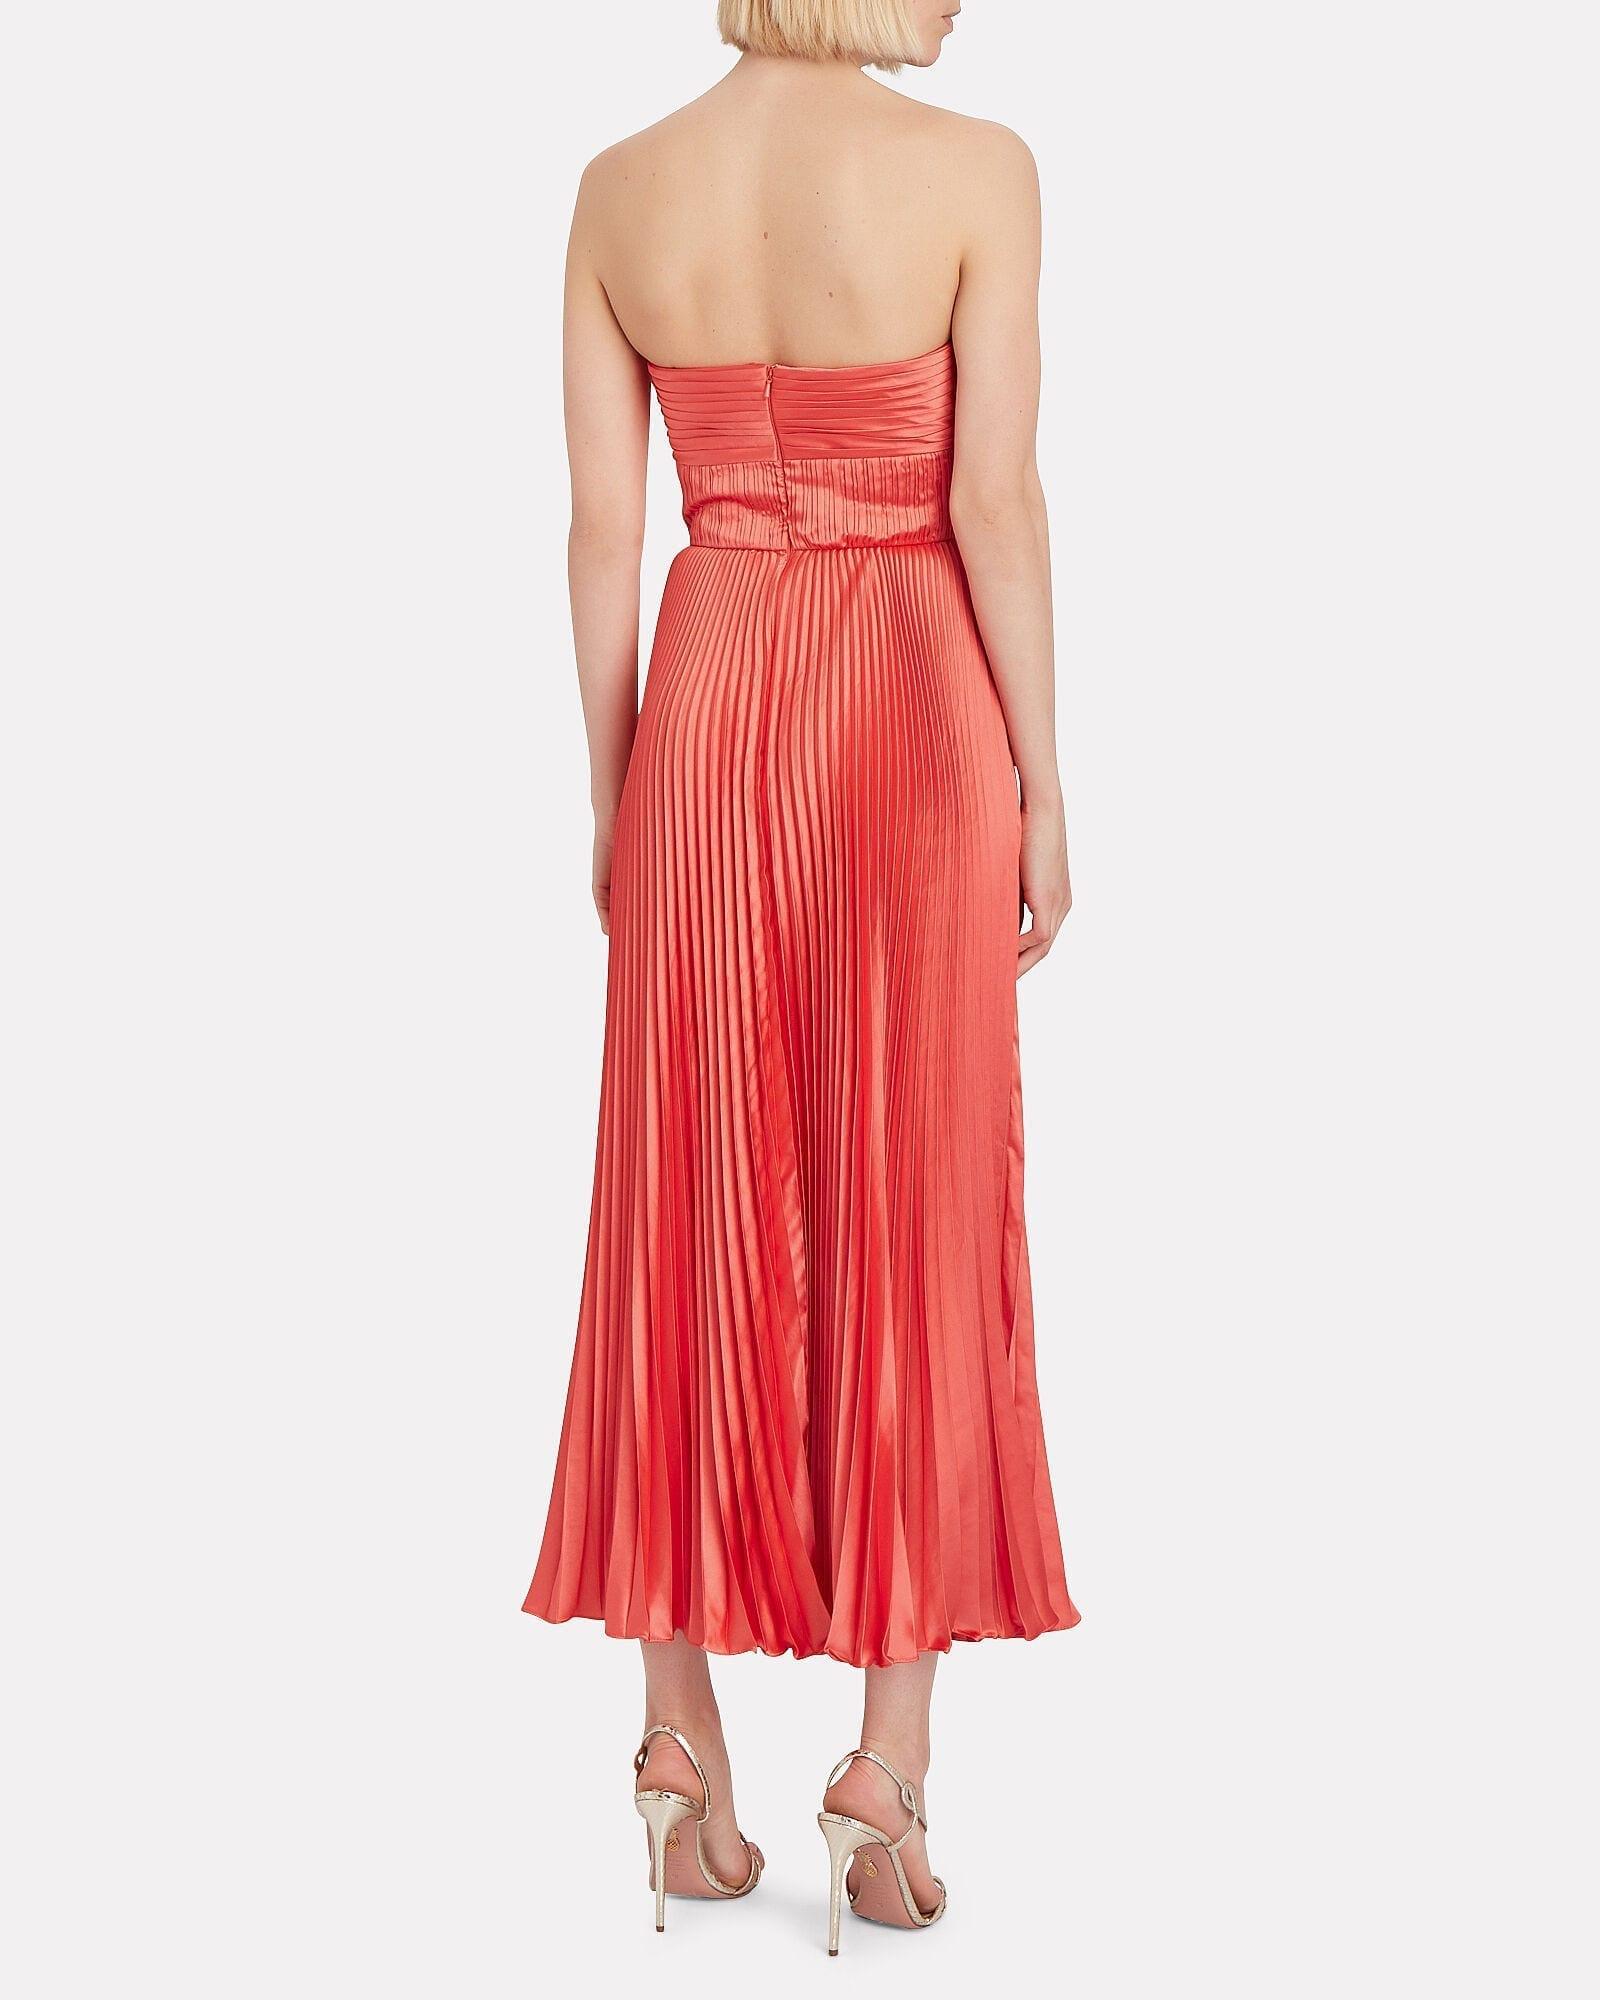 AMUR Belle Strapless Pleated Satin Dress